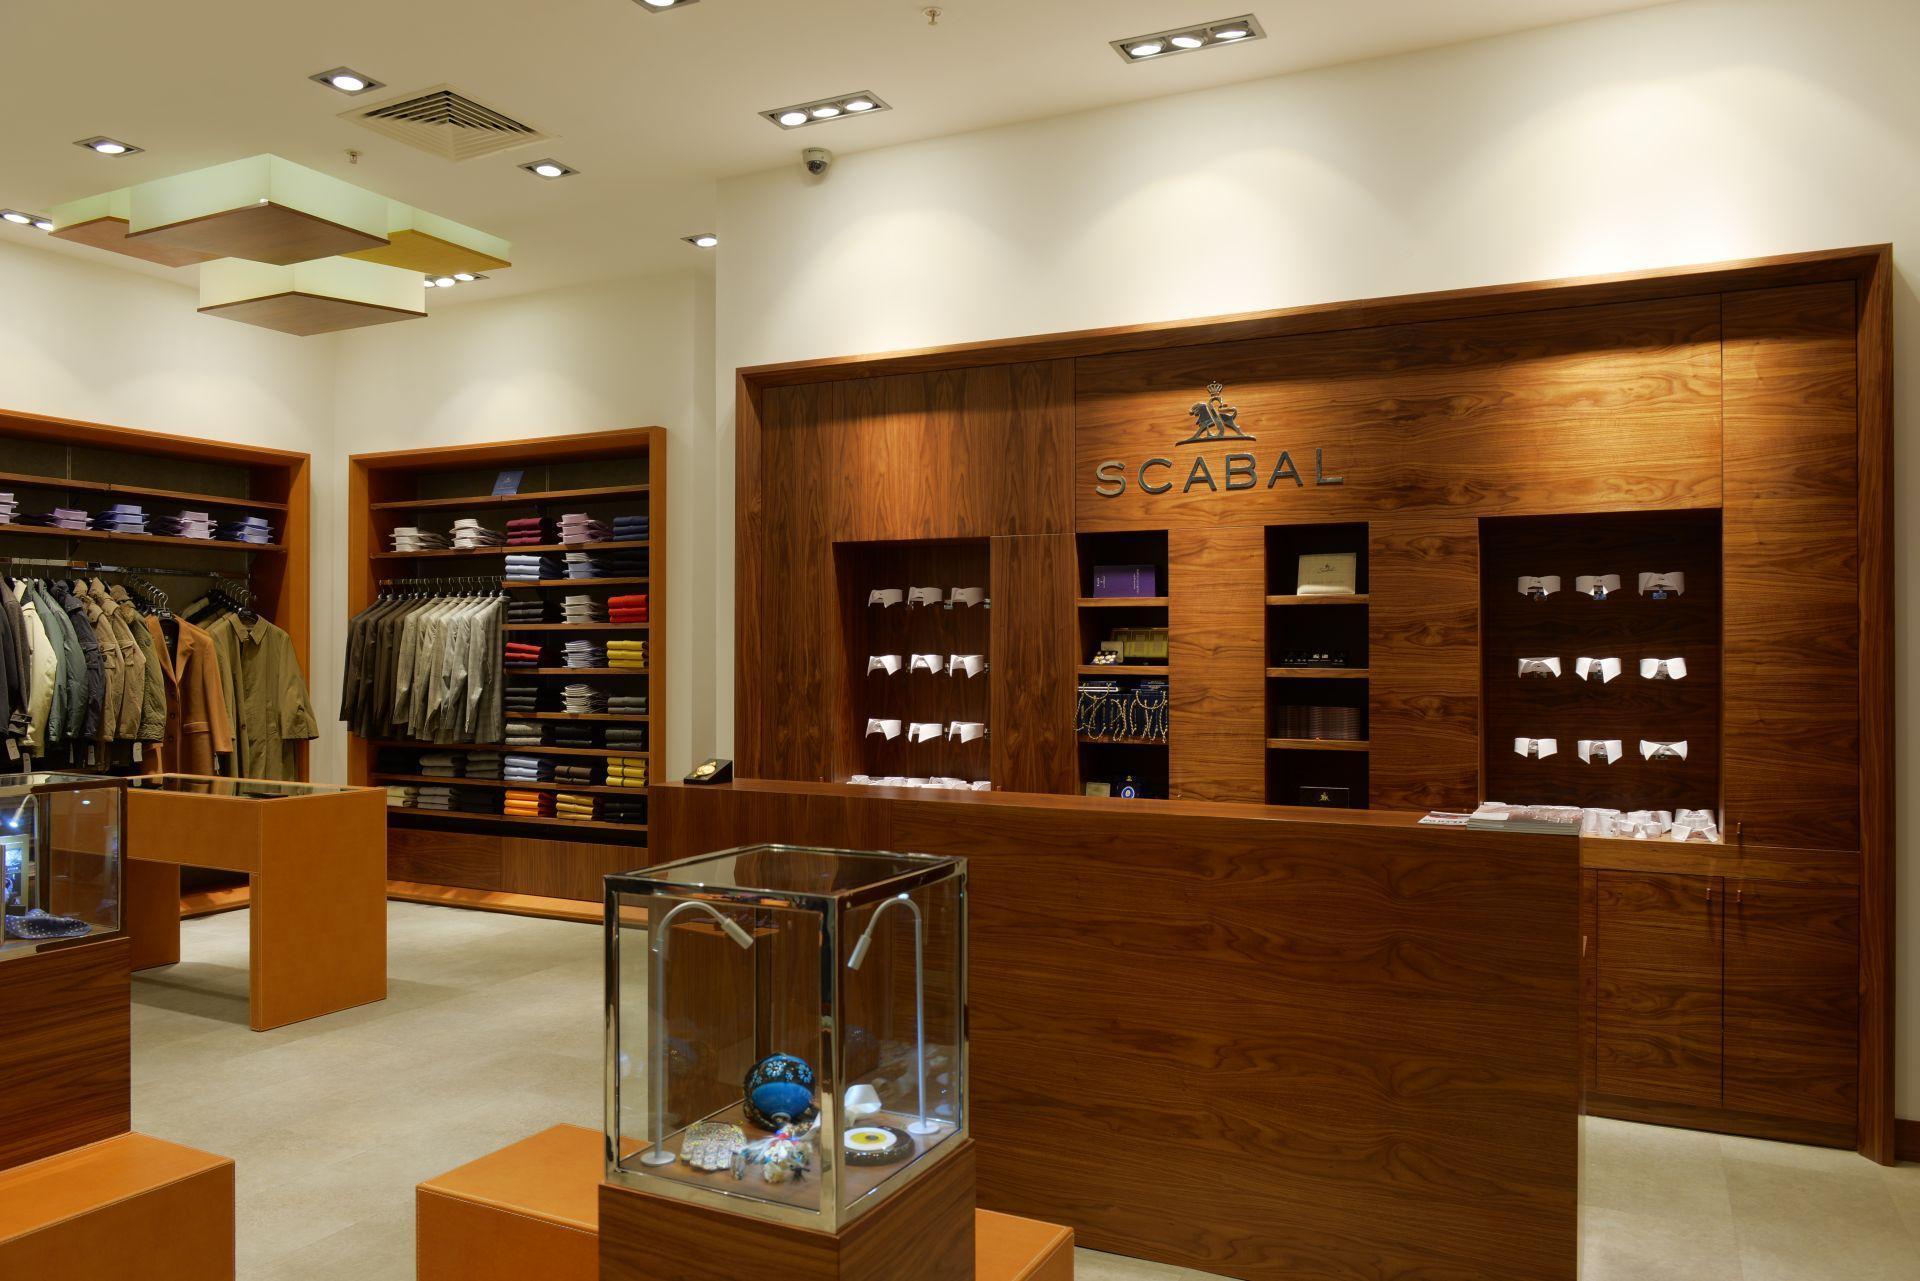 scabal_showroom